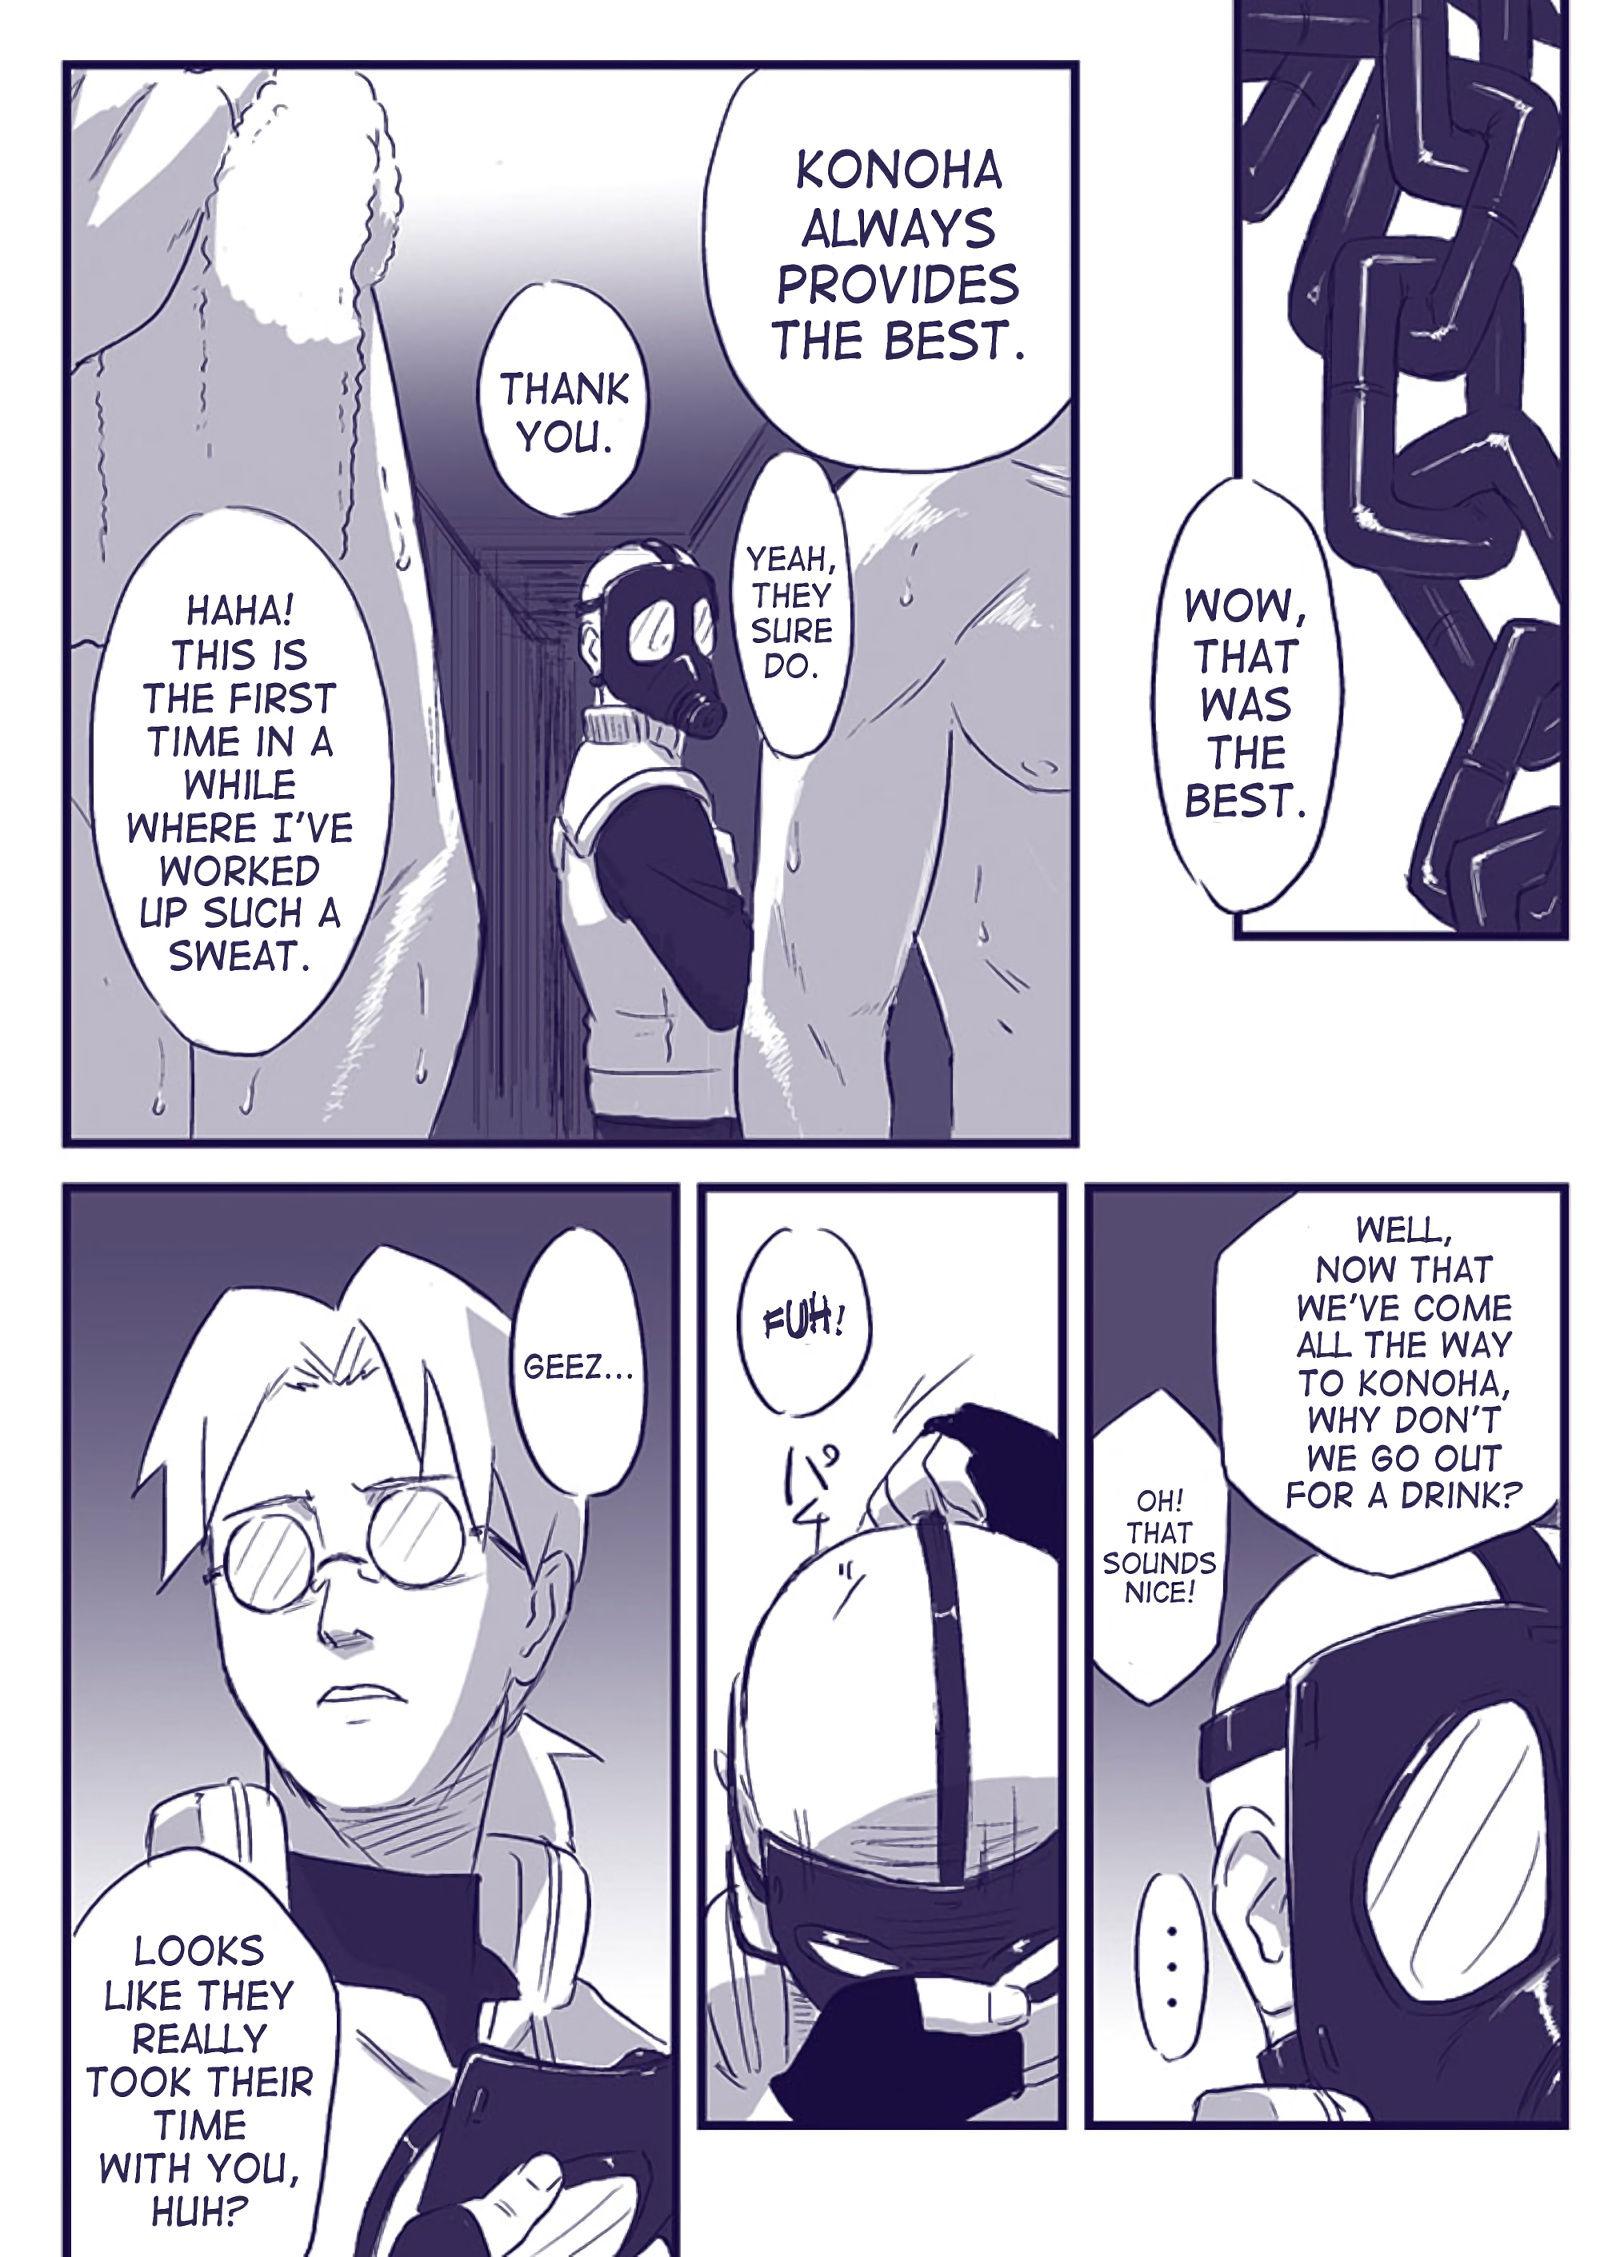 Ninja dependence vol. 2 hentai manga picture 29